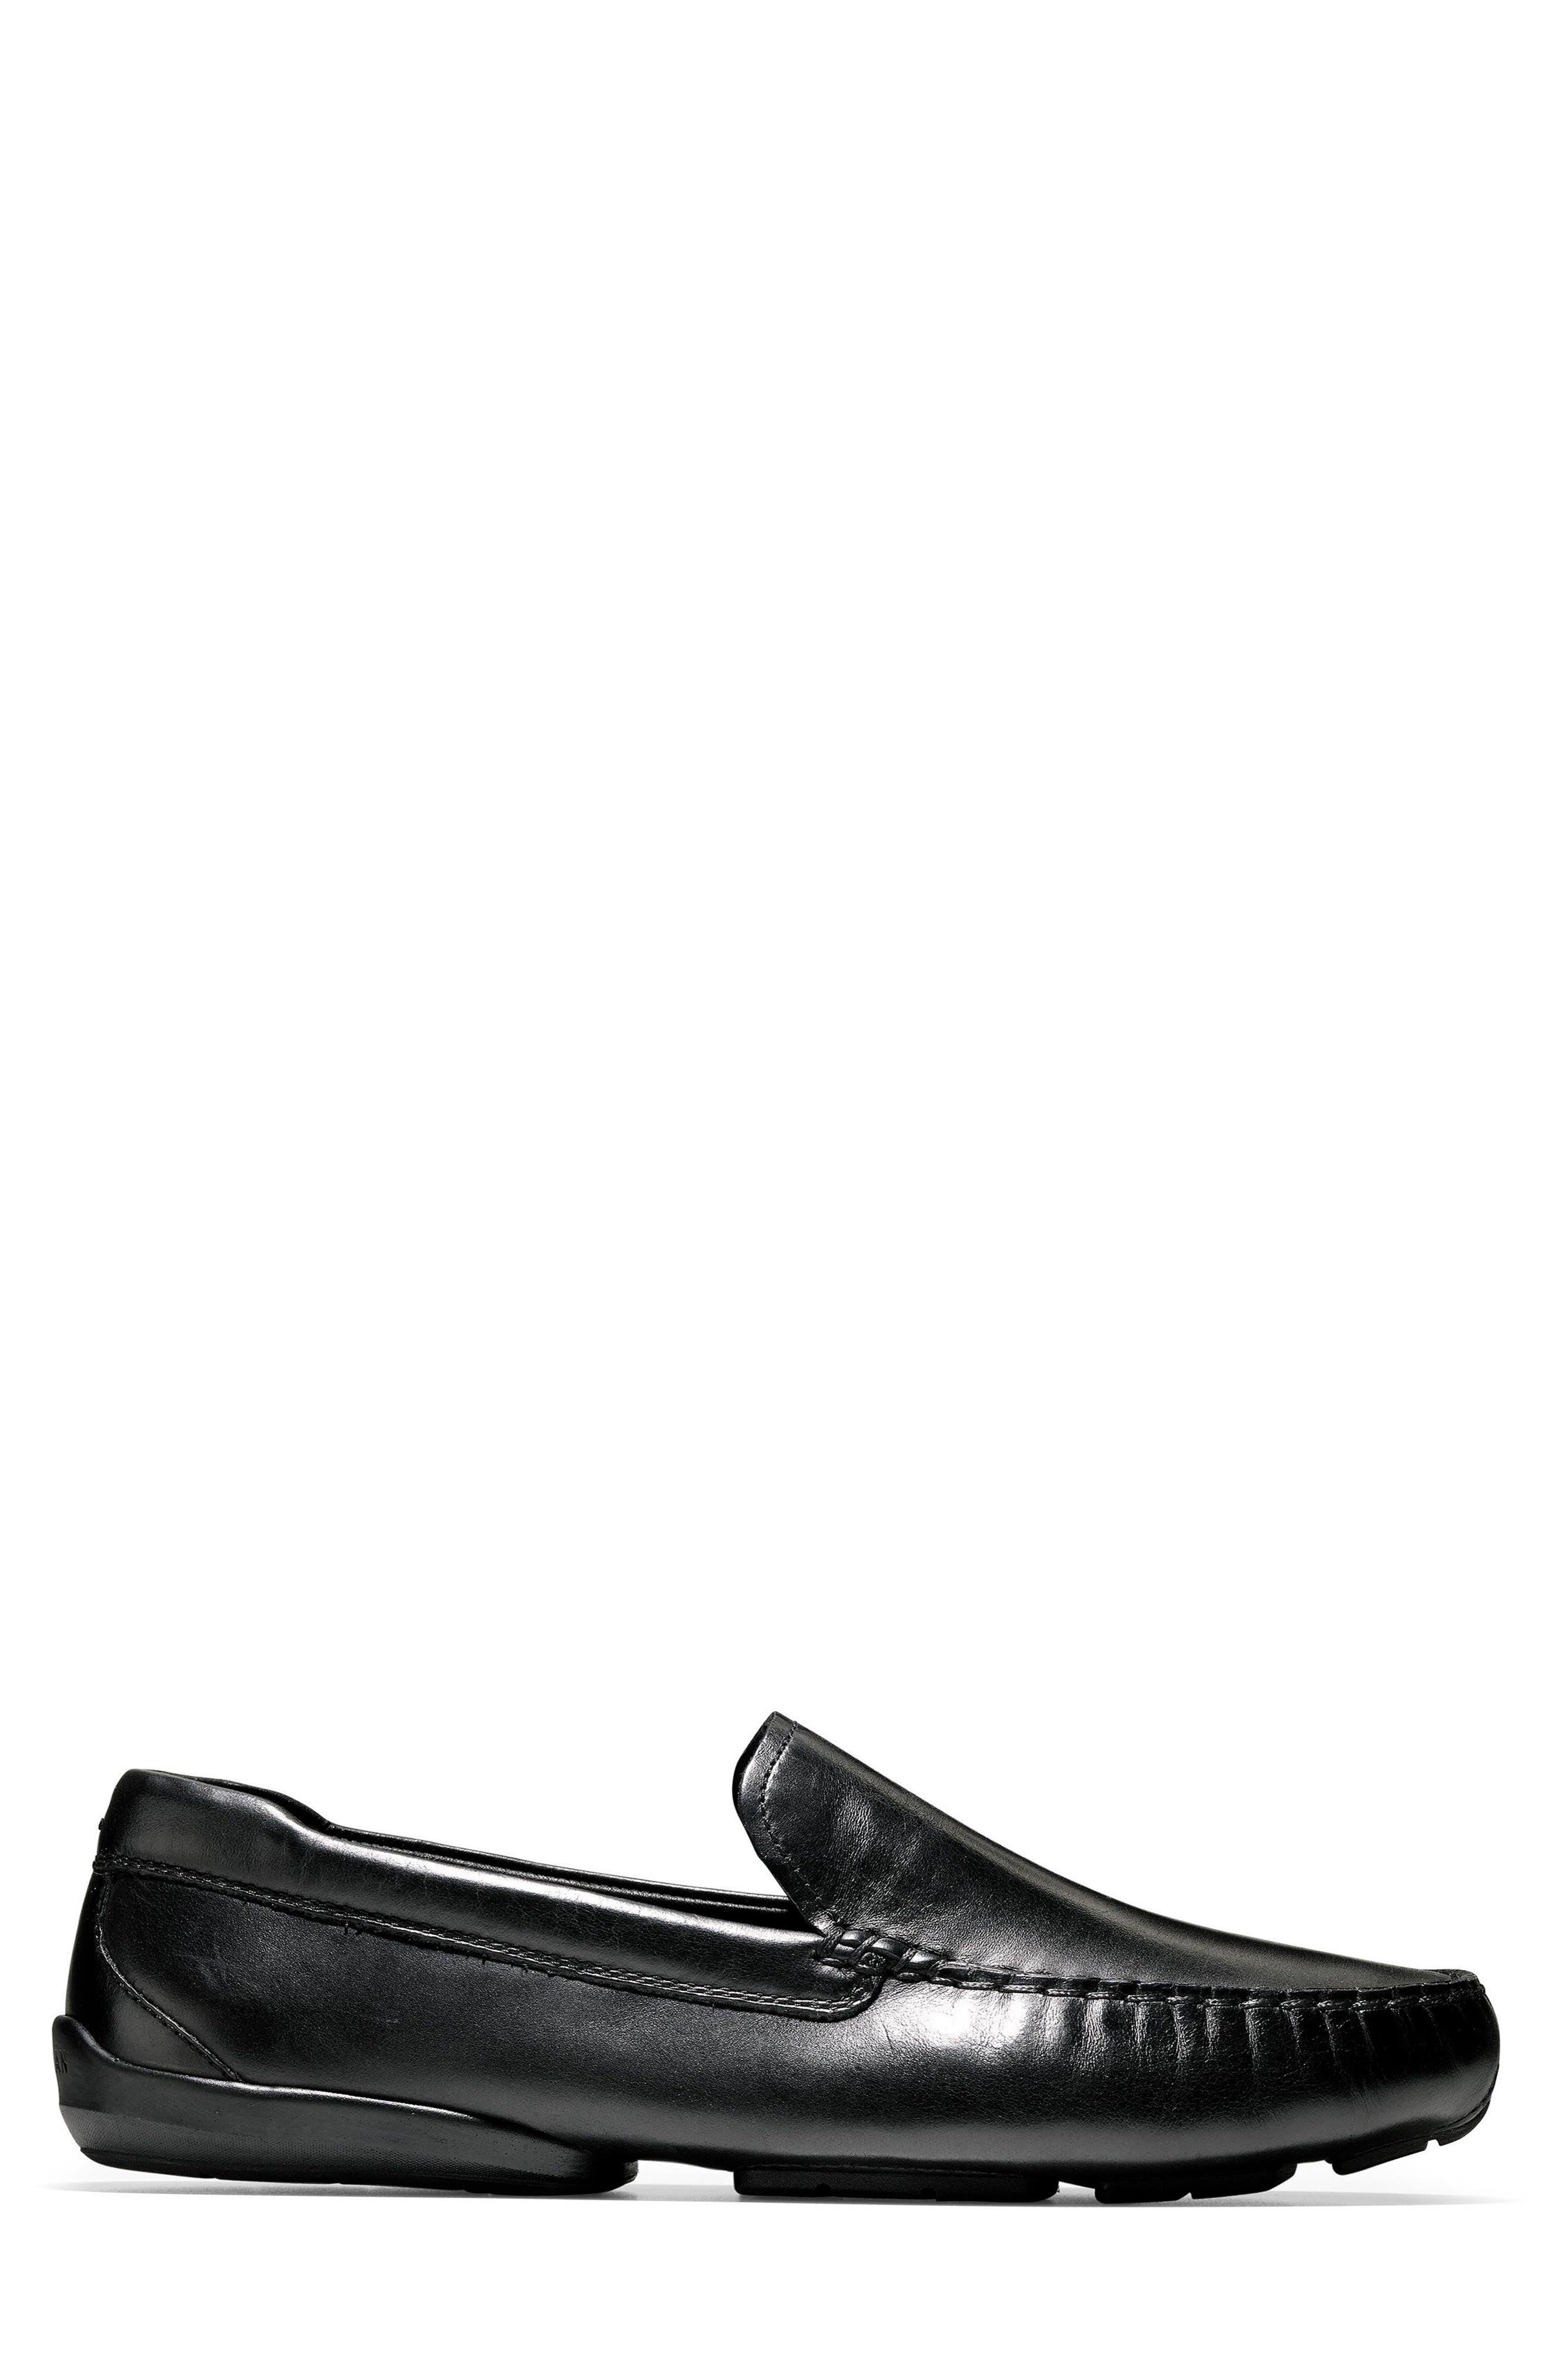 Branson Driving Shoe,                             Alternate thumbnail 3, color,                             Black Leather